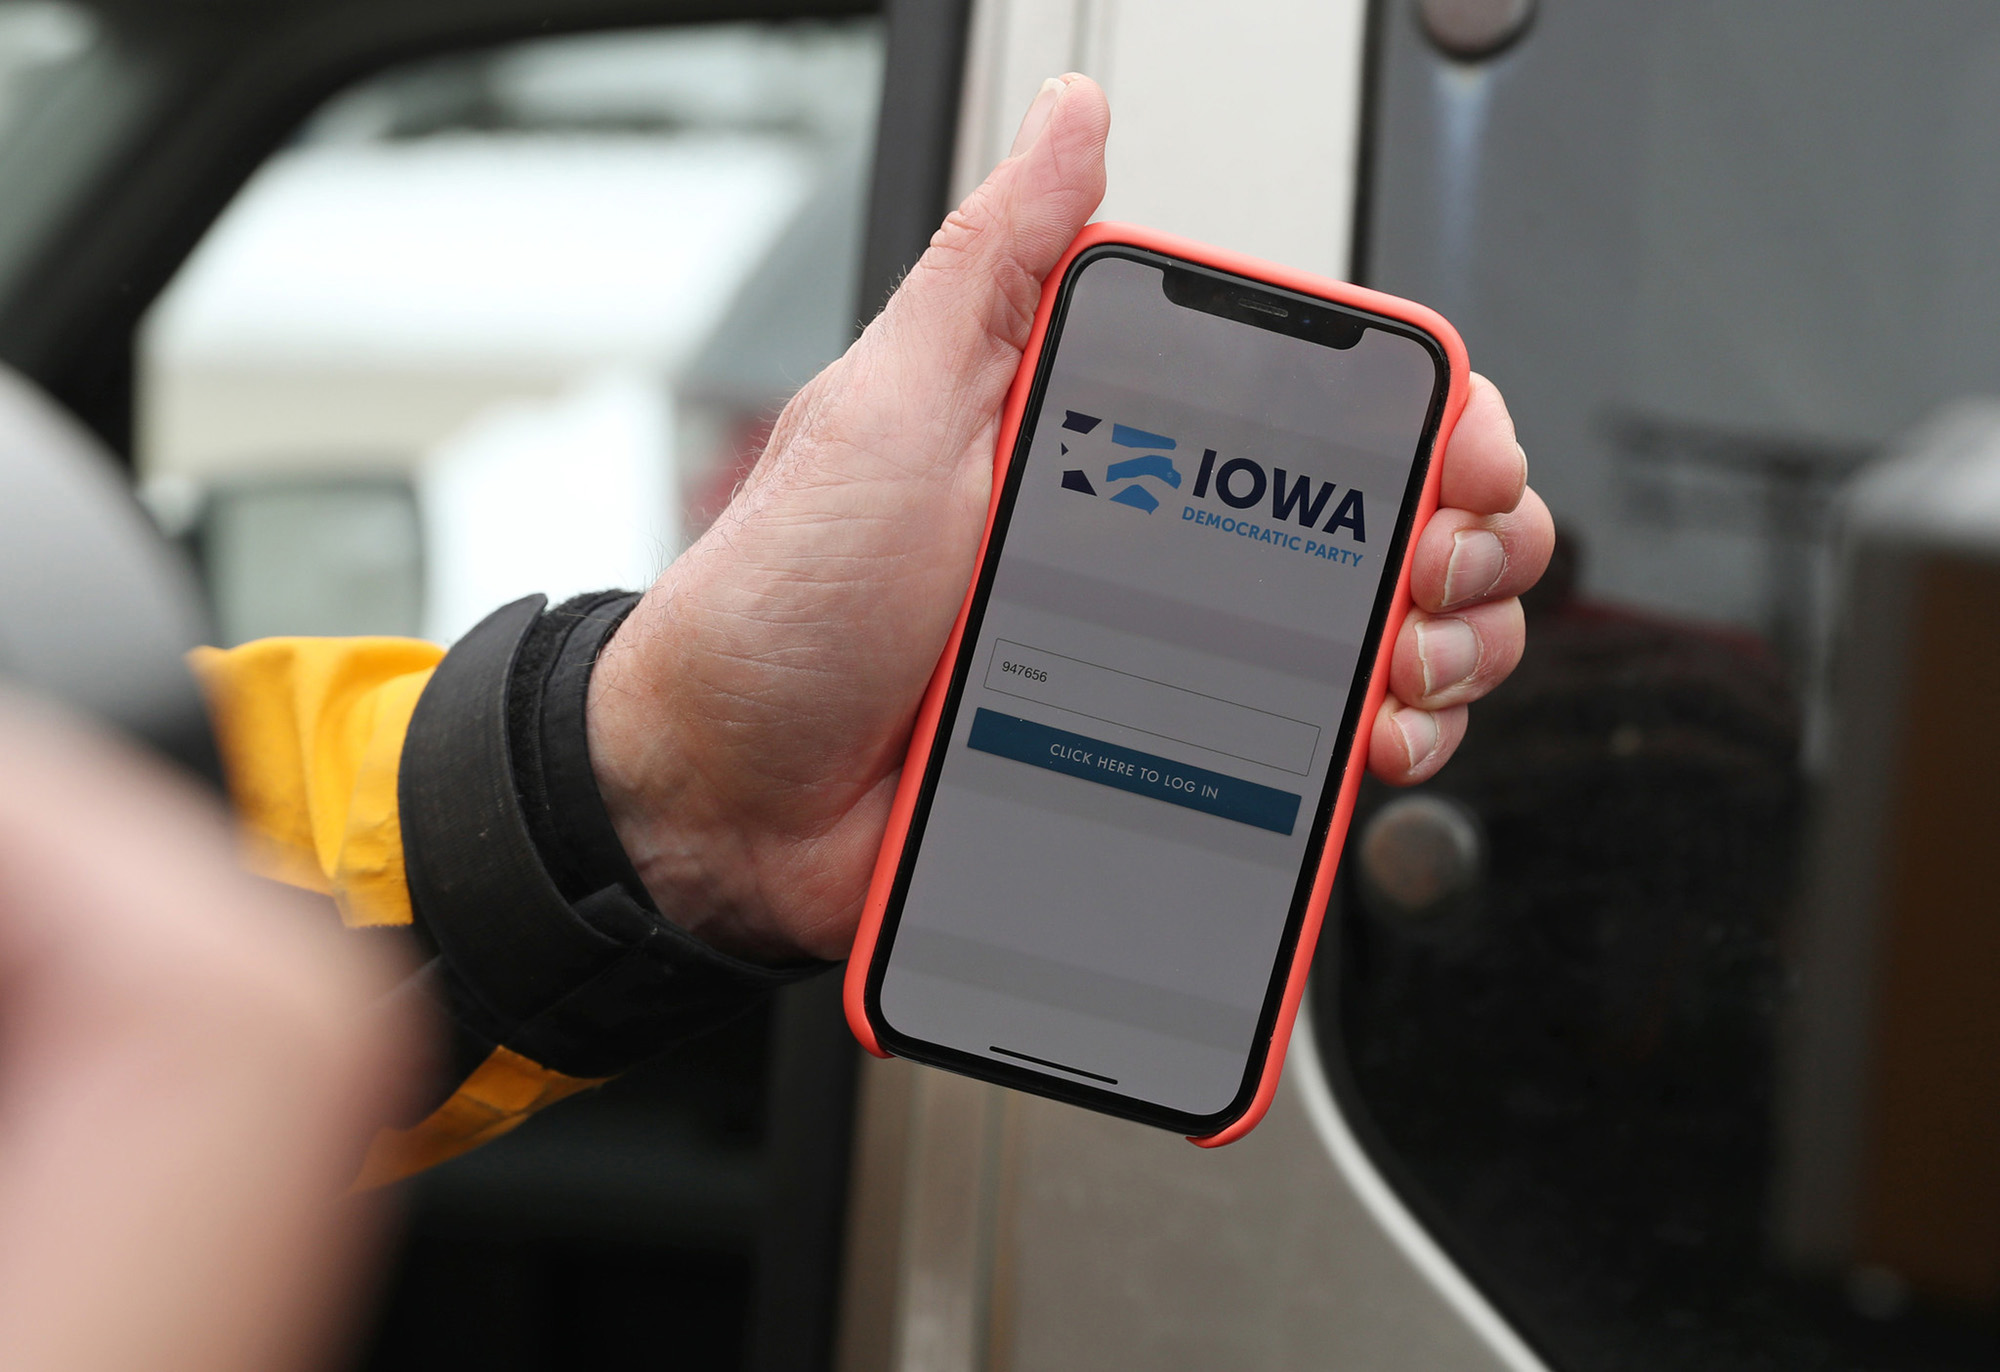 A precinct chair shows the 2020 Iowa Caucus mobile app on his phone.